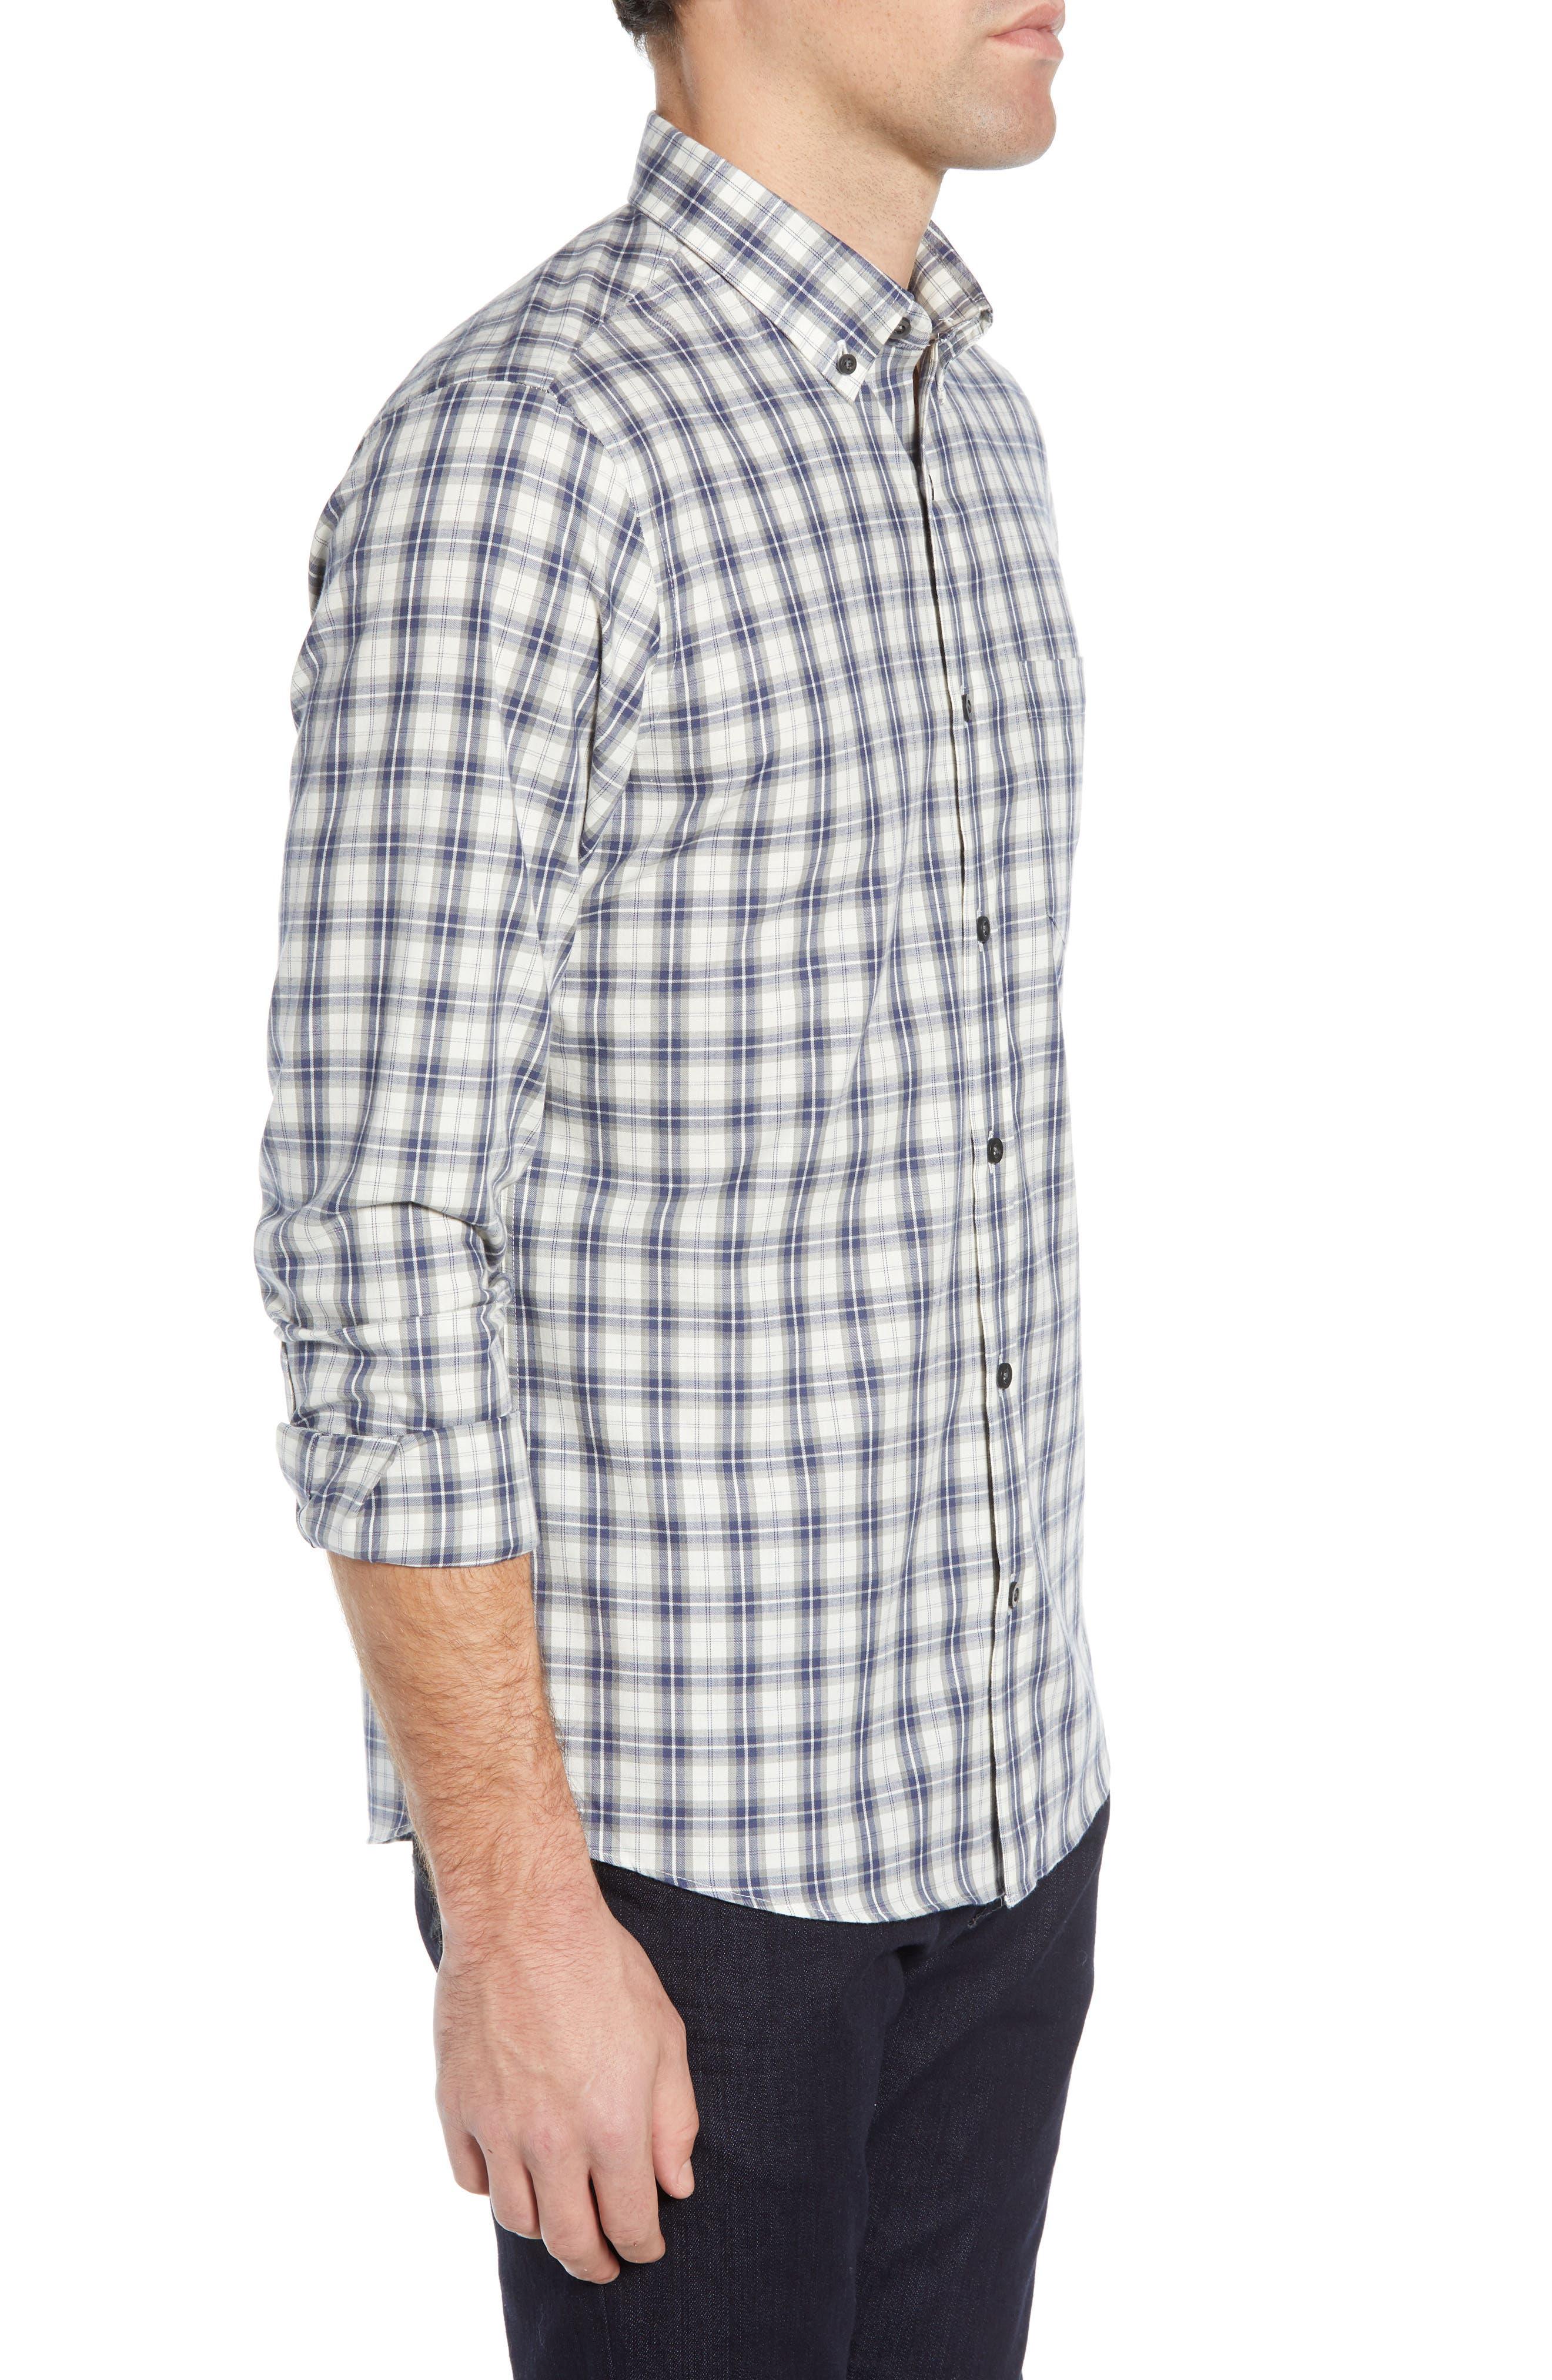 Slim Fit Plaid Sport Shirt,                             Alternate thumbnail 4, color,                             WHITE BLUE ENSIGN GREY PLAID